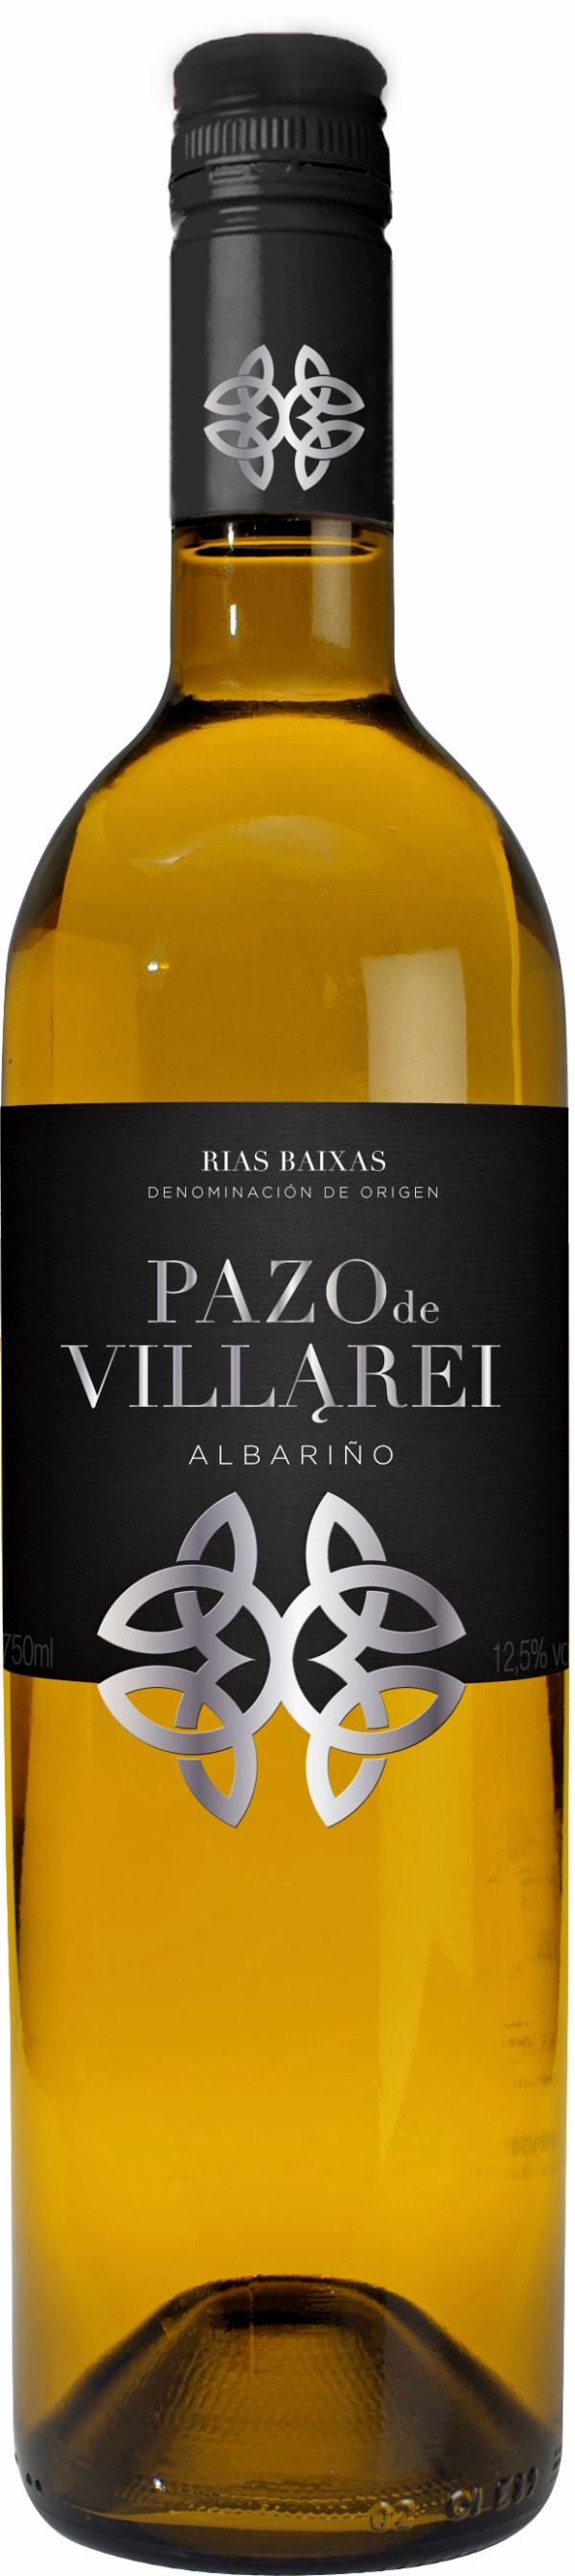 Pazo de Villarei Albariño 2019